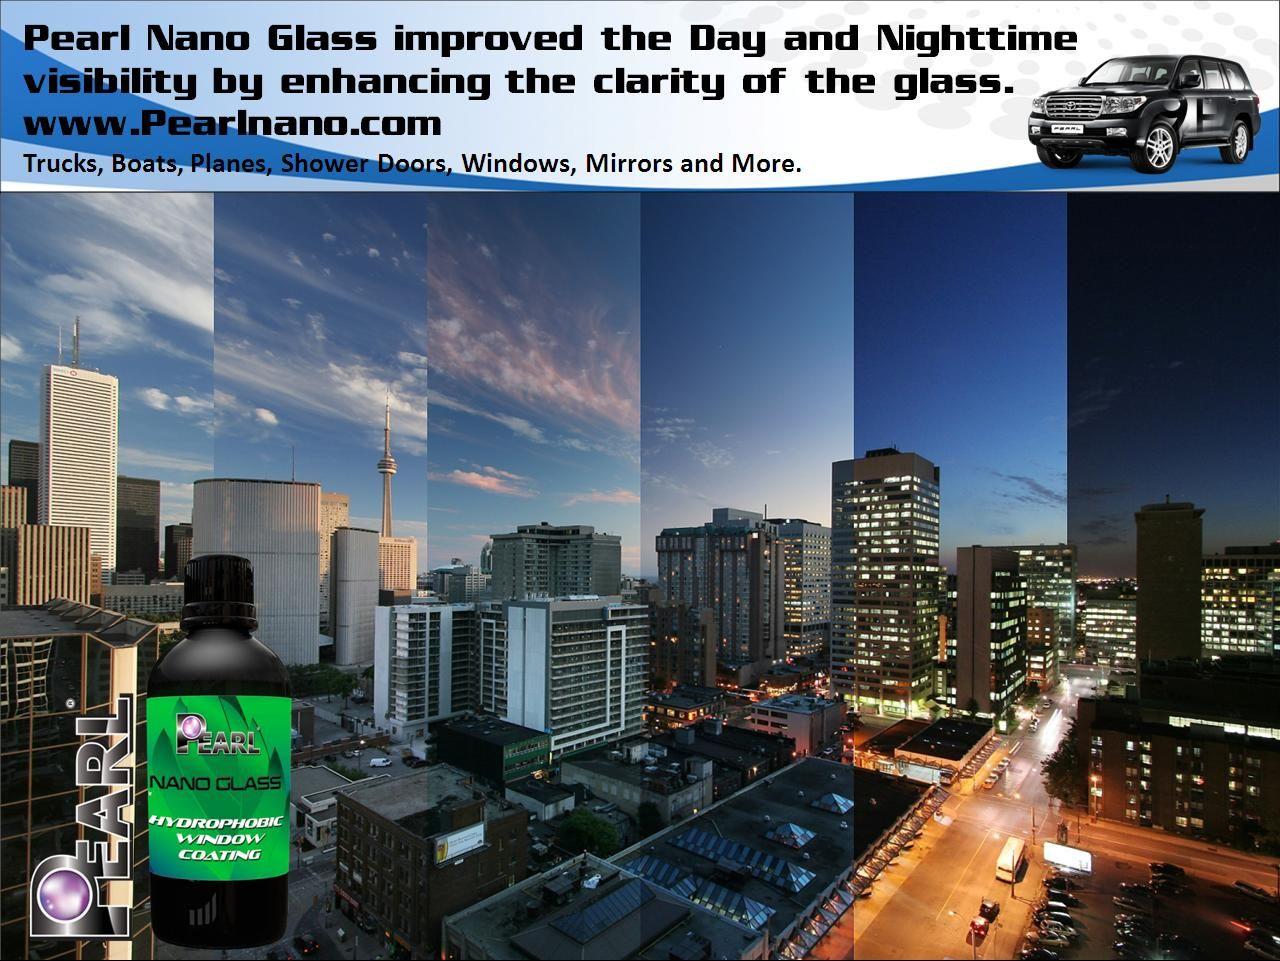 Pearl Nano Glass was developed with the latest in nano